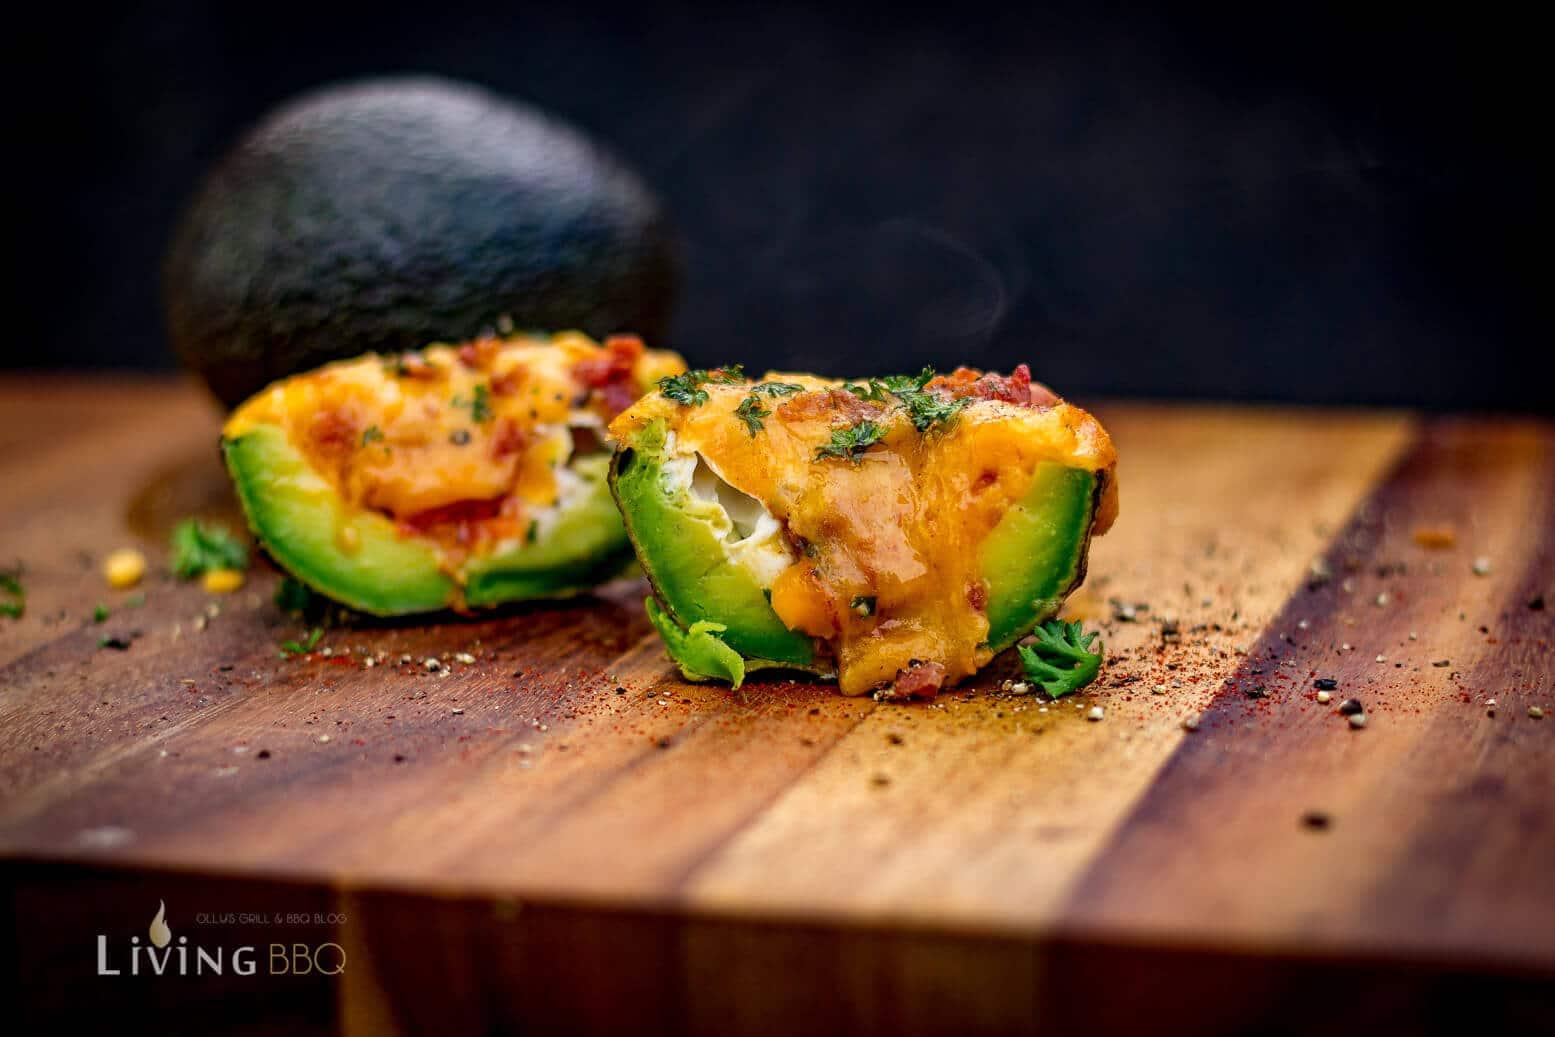 Avocado Rezept Ei Bacon Frühstück avocado_Avocado Rezept Ei Bacon Fru  hstu  ck 33 von 44